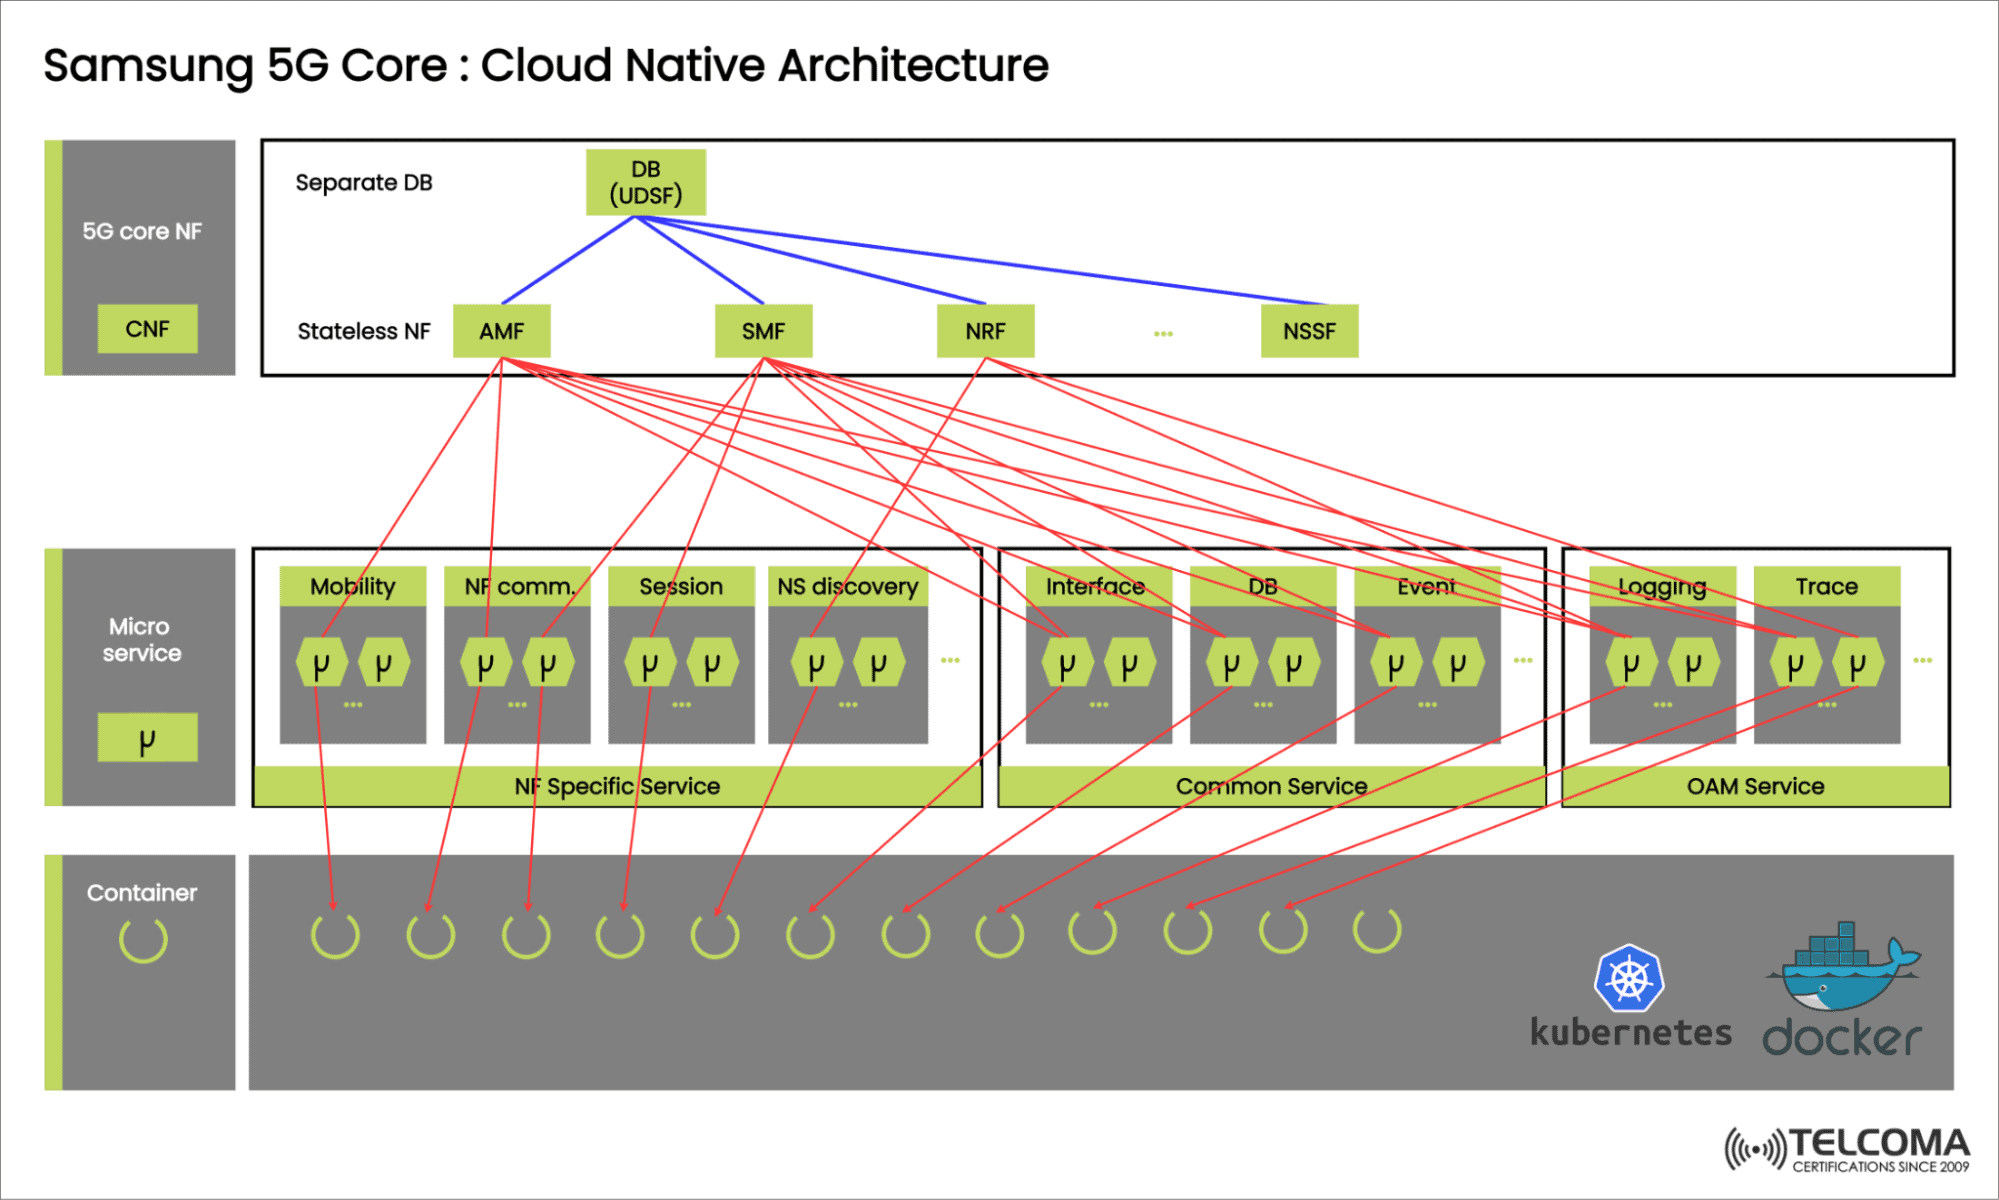 5g core cloud native architecture